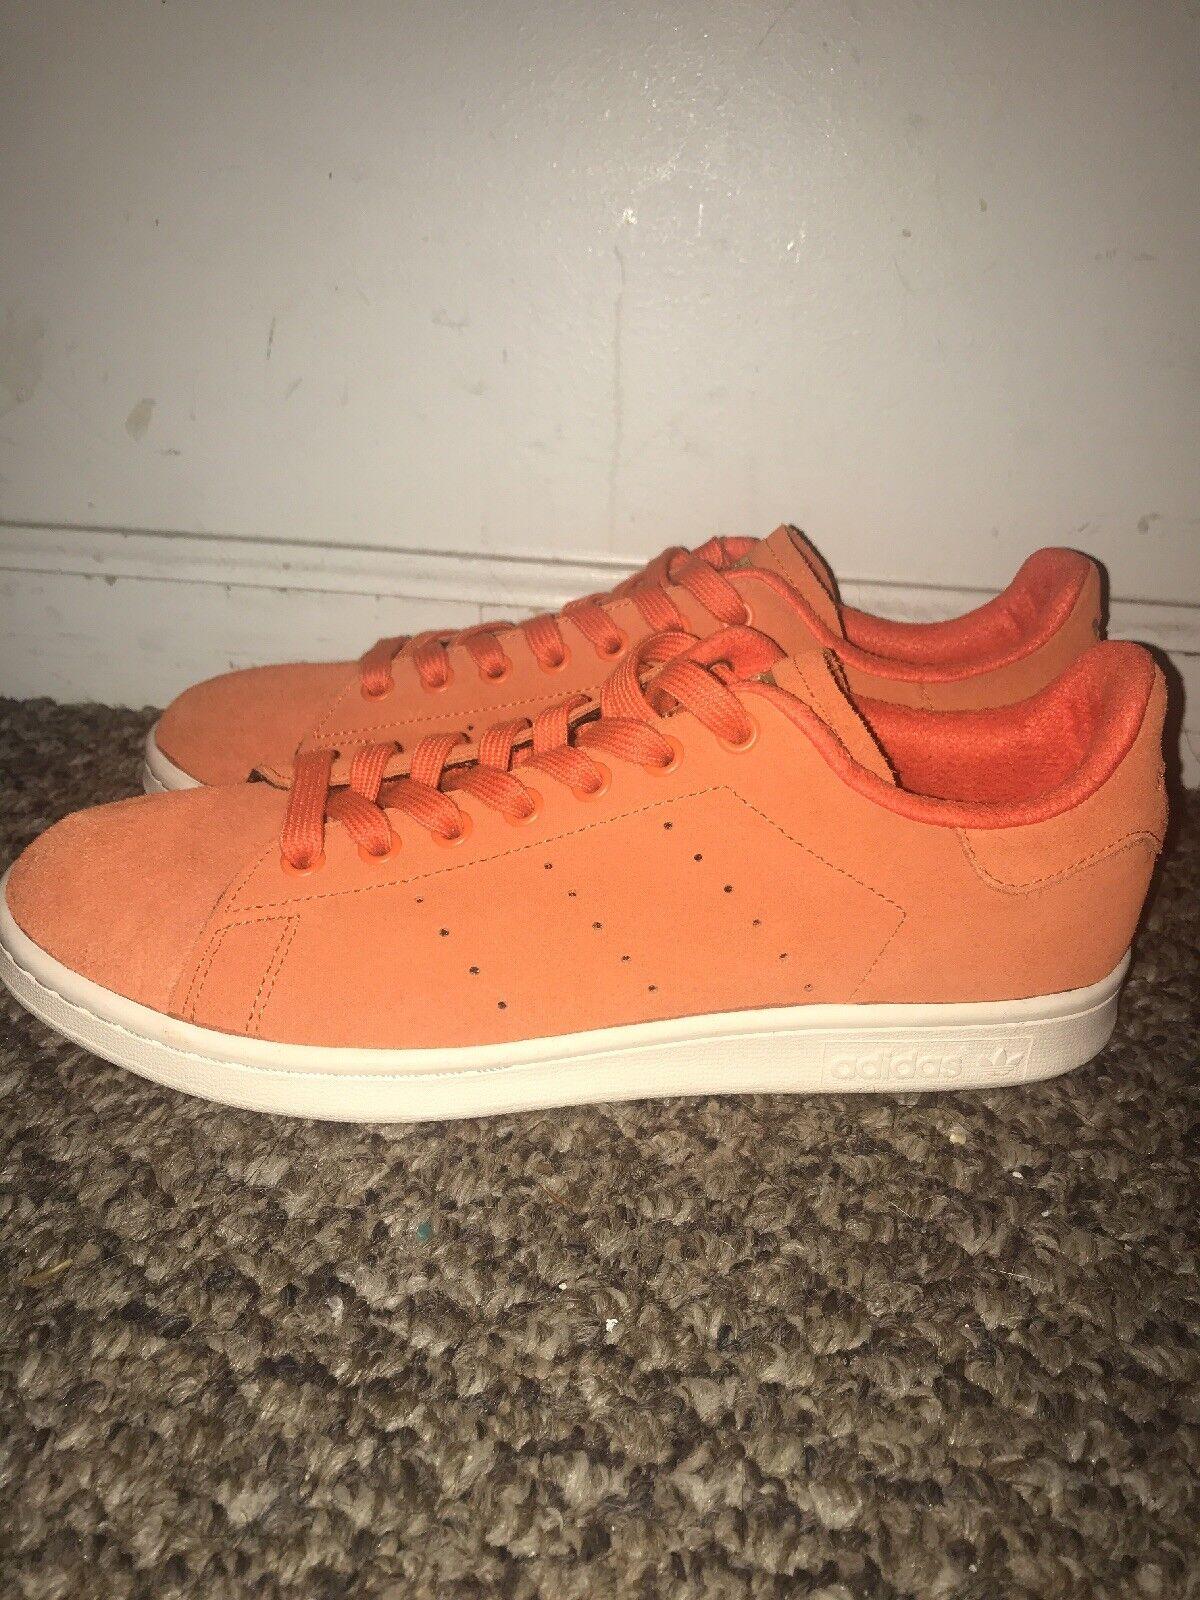 Adidas stan smith numero 9 orange camoscio